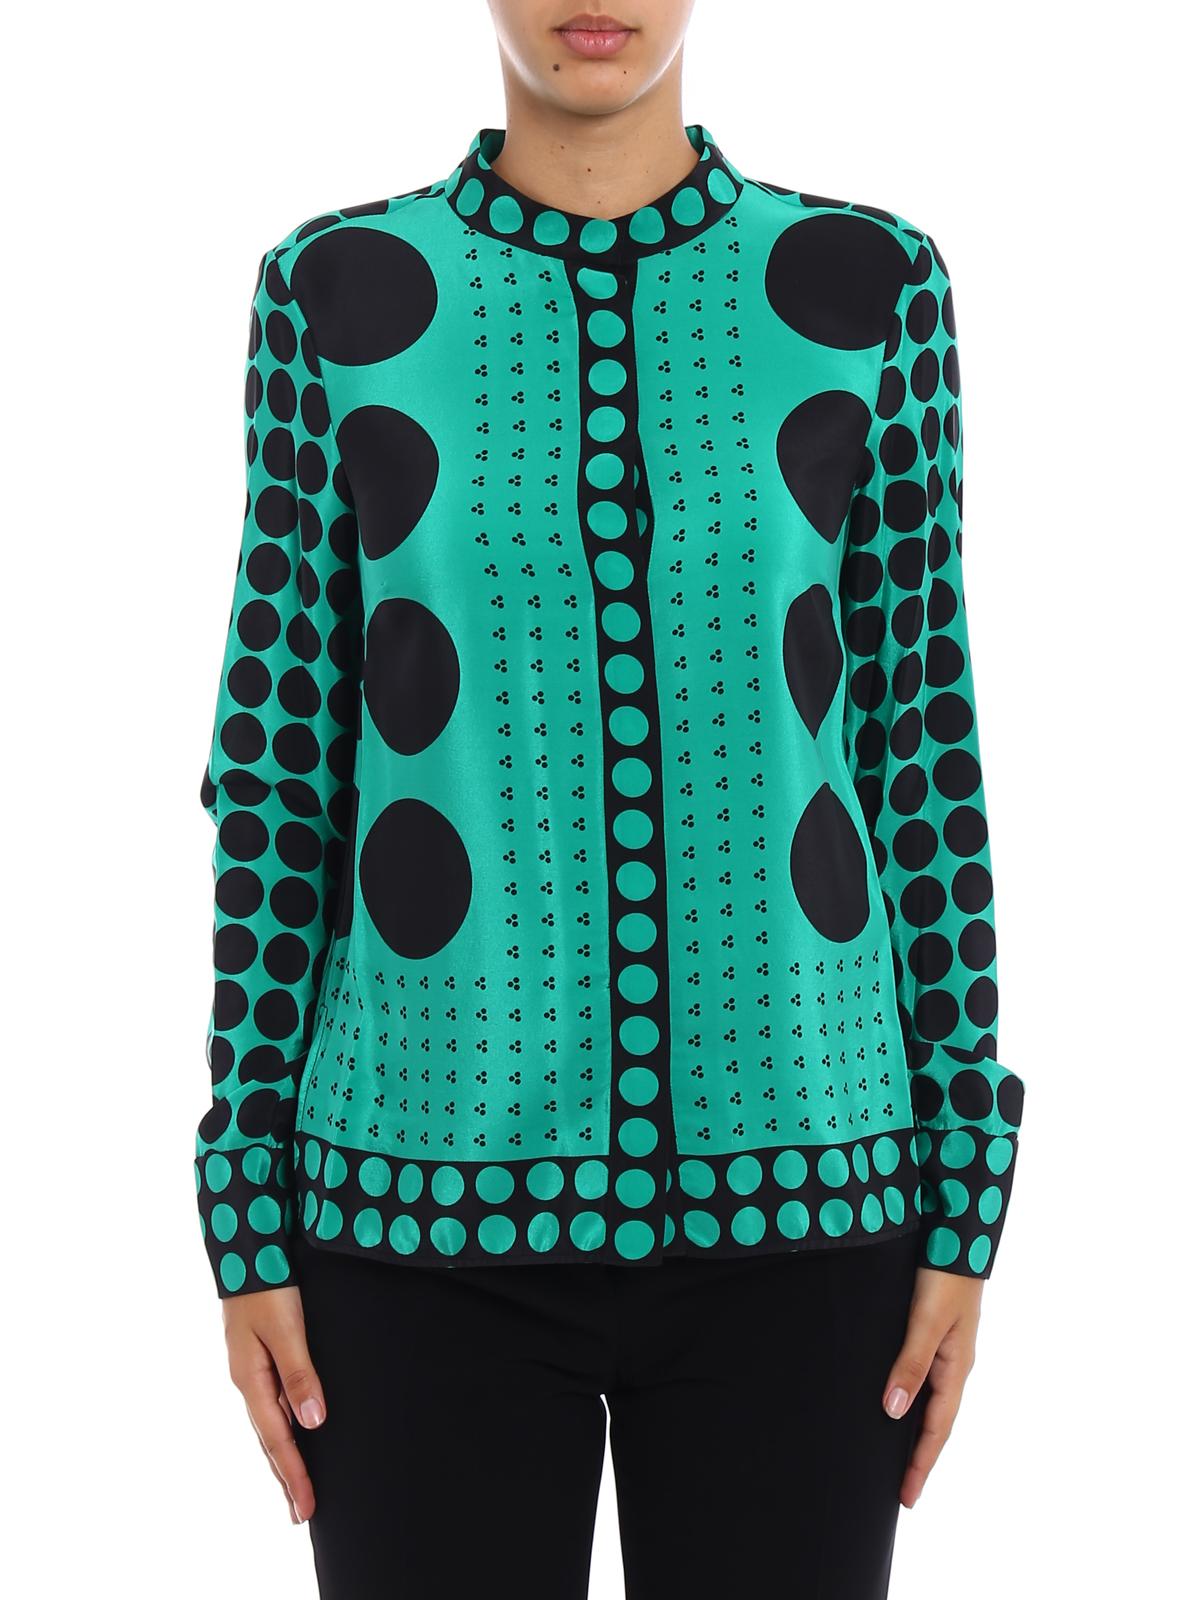 7789fd541a332 iKRIX Diane von Furstenberg: shirts - Brunel Evergreen print silk shirt